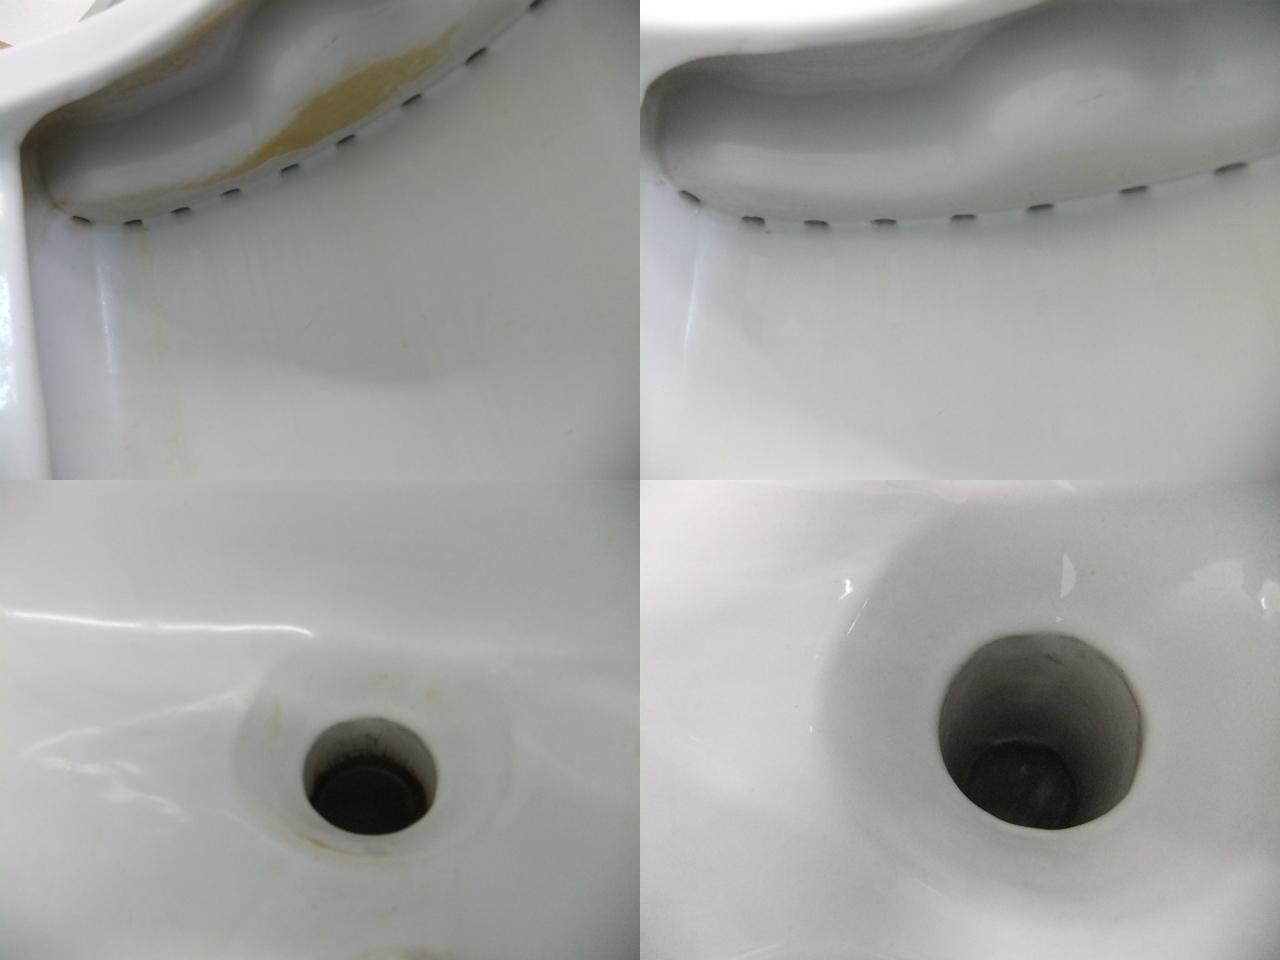 http://ajras.net/images/120807-toilet2.jpg